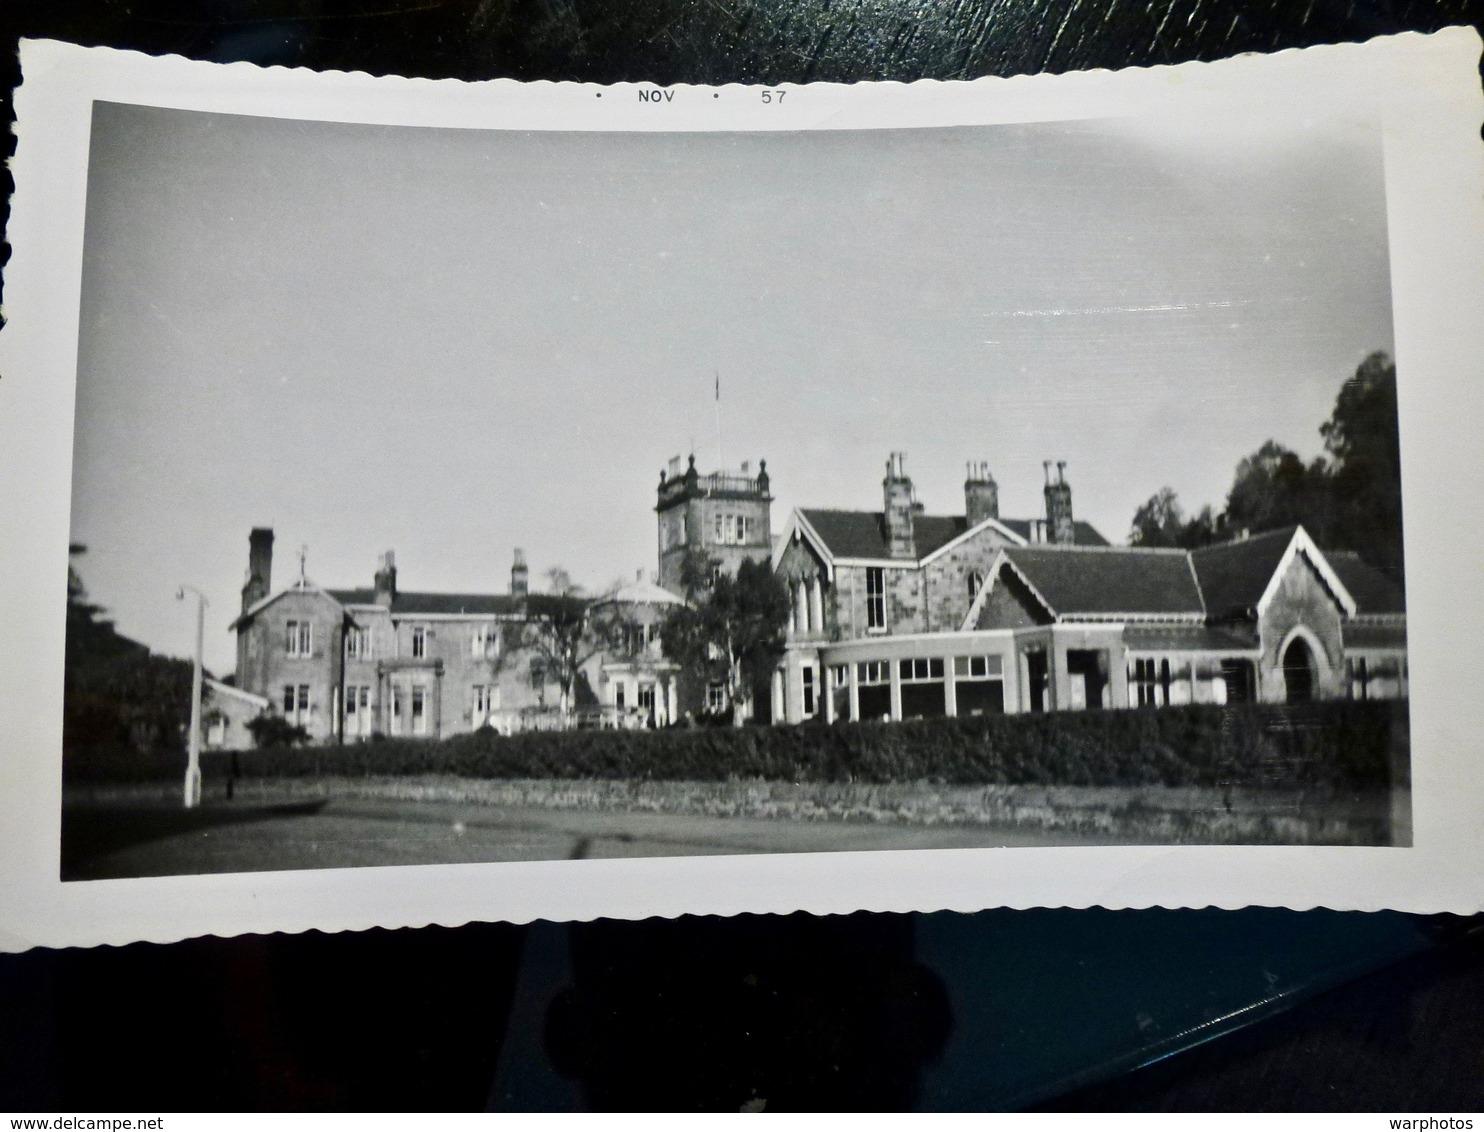 PHOTO ORIGINALE _ VINTAGE SNAPSHOT : ALLARI WATER HOTEL _ BRIDGE Of ALLAN _ ECOSSE _ 1957 - Lieux